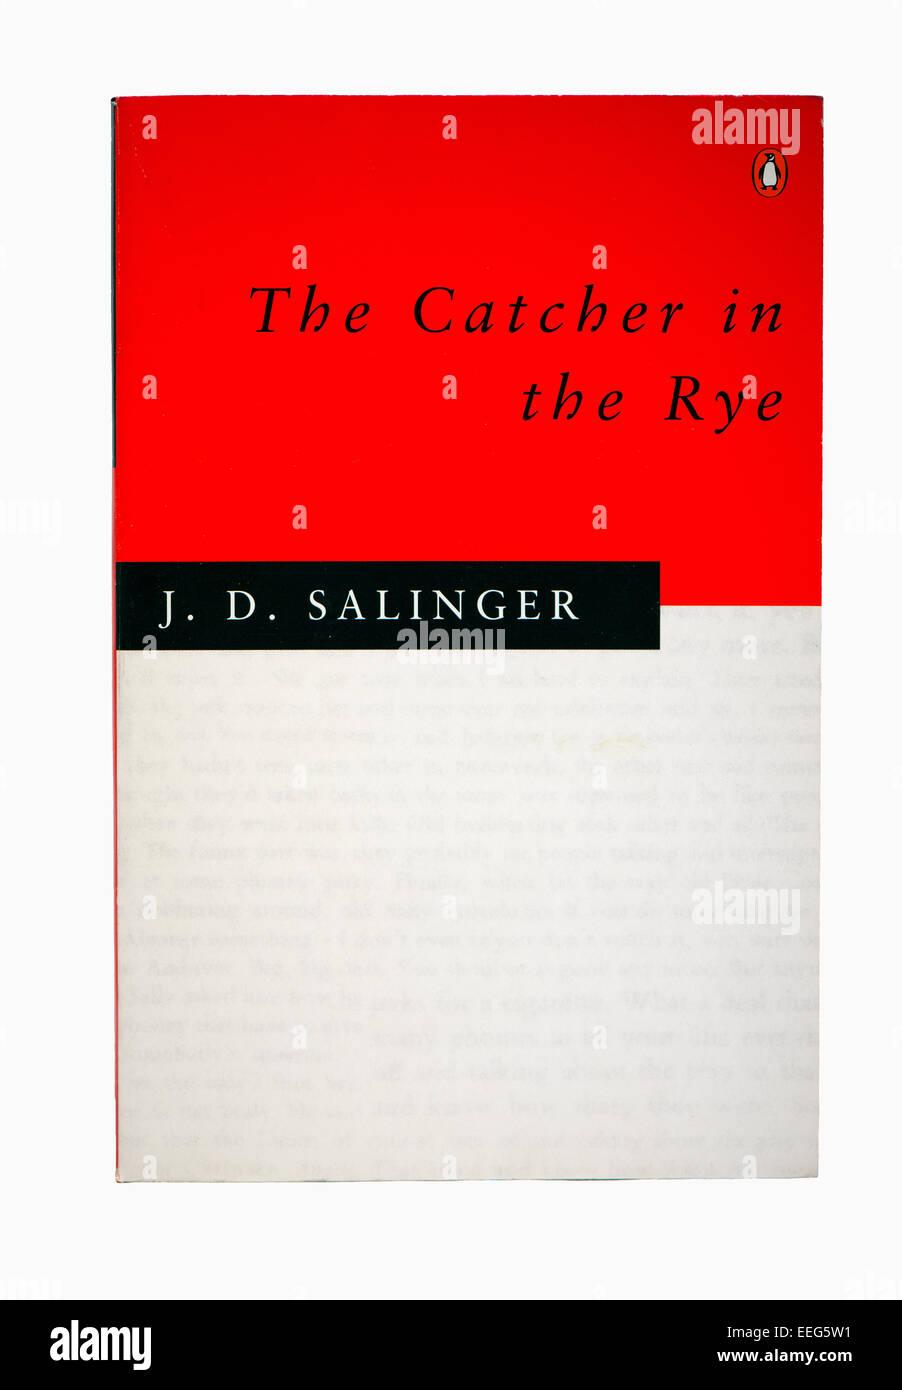 Penguin Book Cover Download : J d salinger the catcher in rye penguin classic book